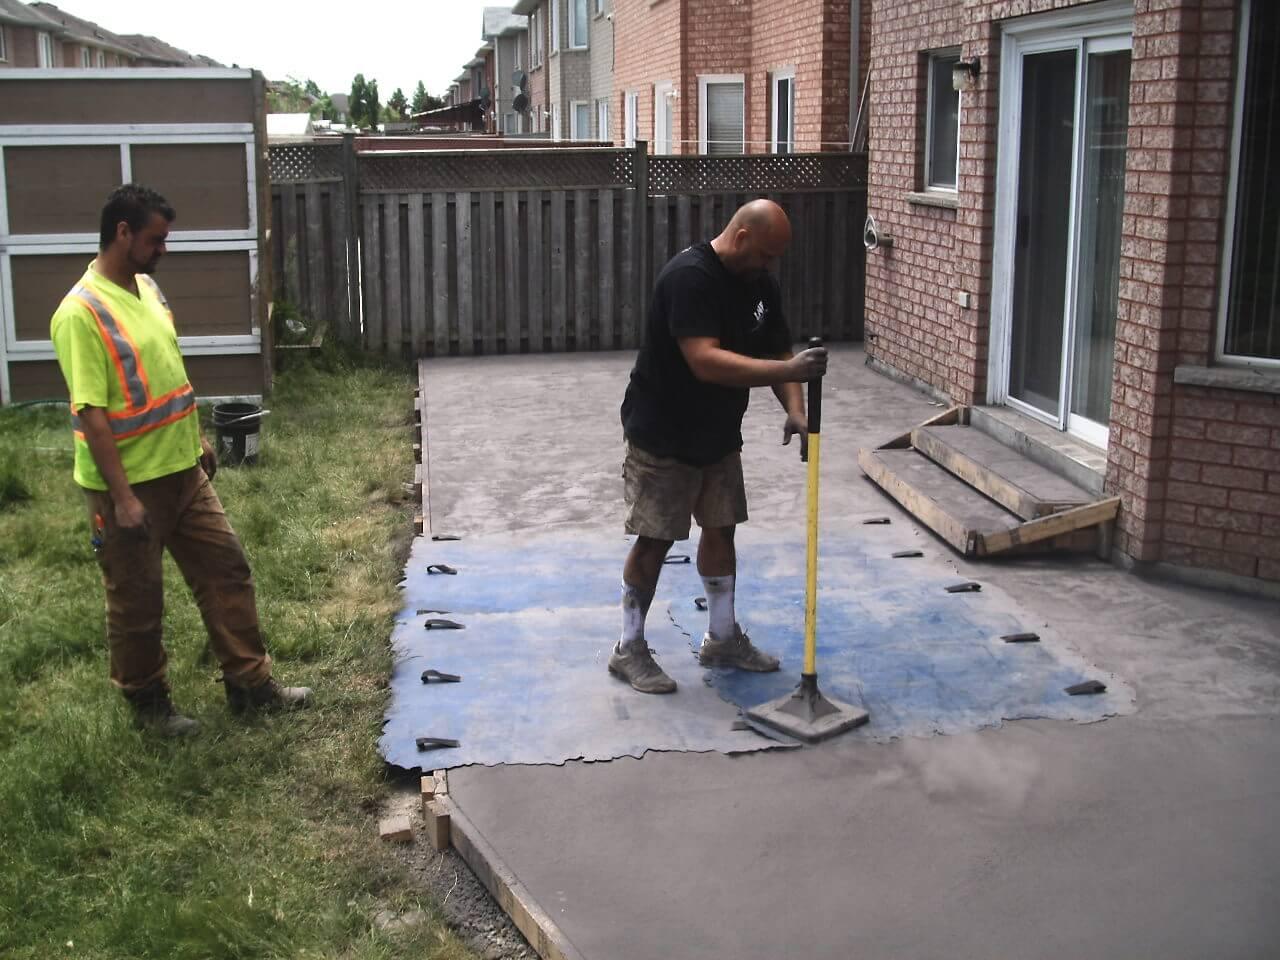 Decorative-Concrete-Construction-Contractor-Toronto-1-1